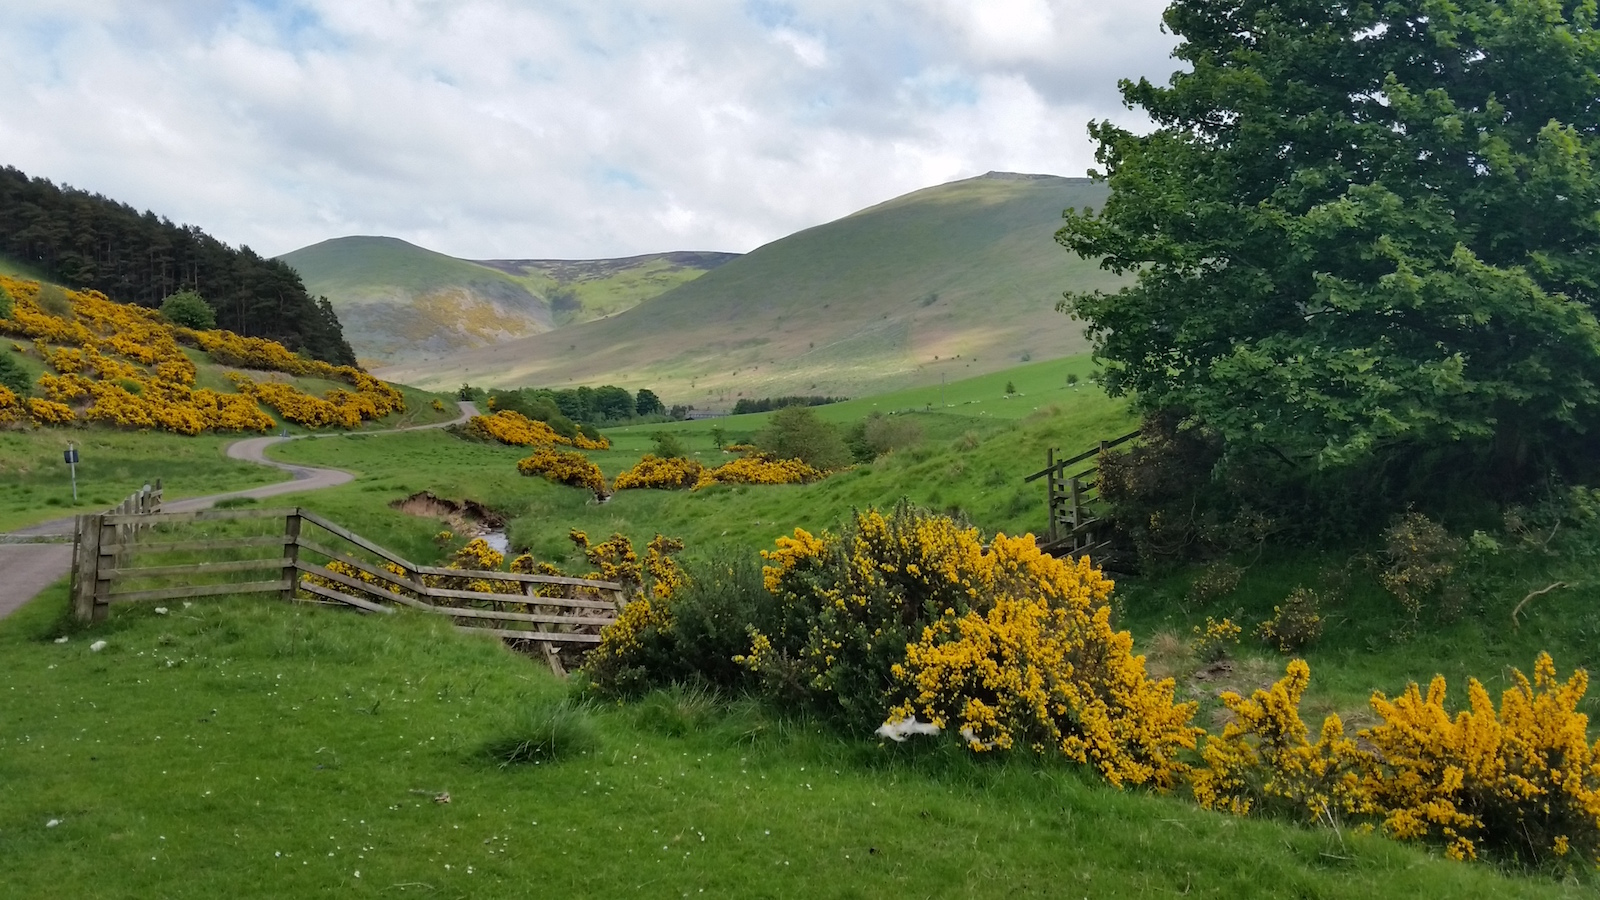 scottish-borders-schotland-landweggetje